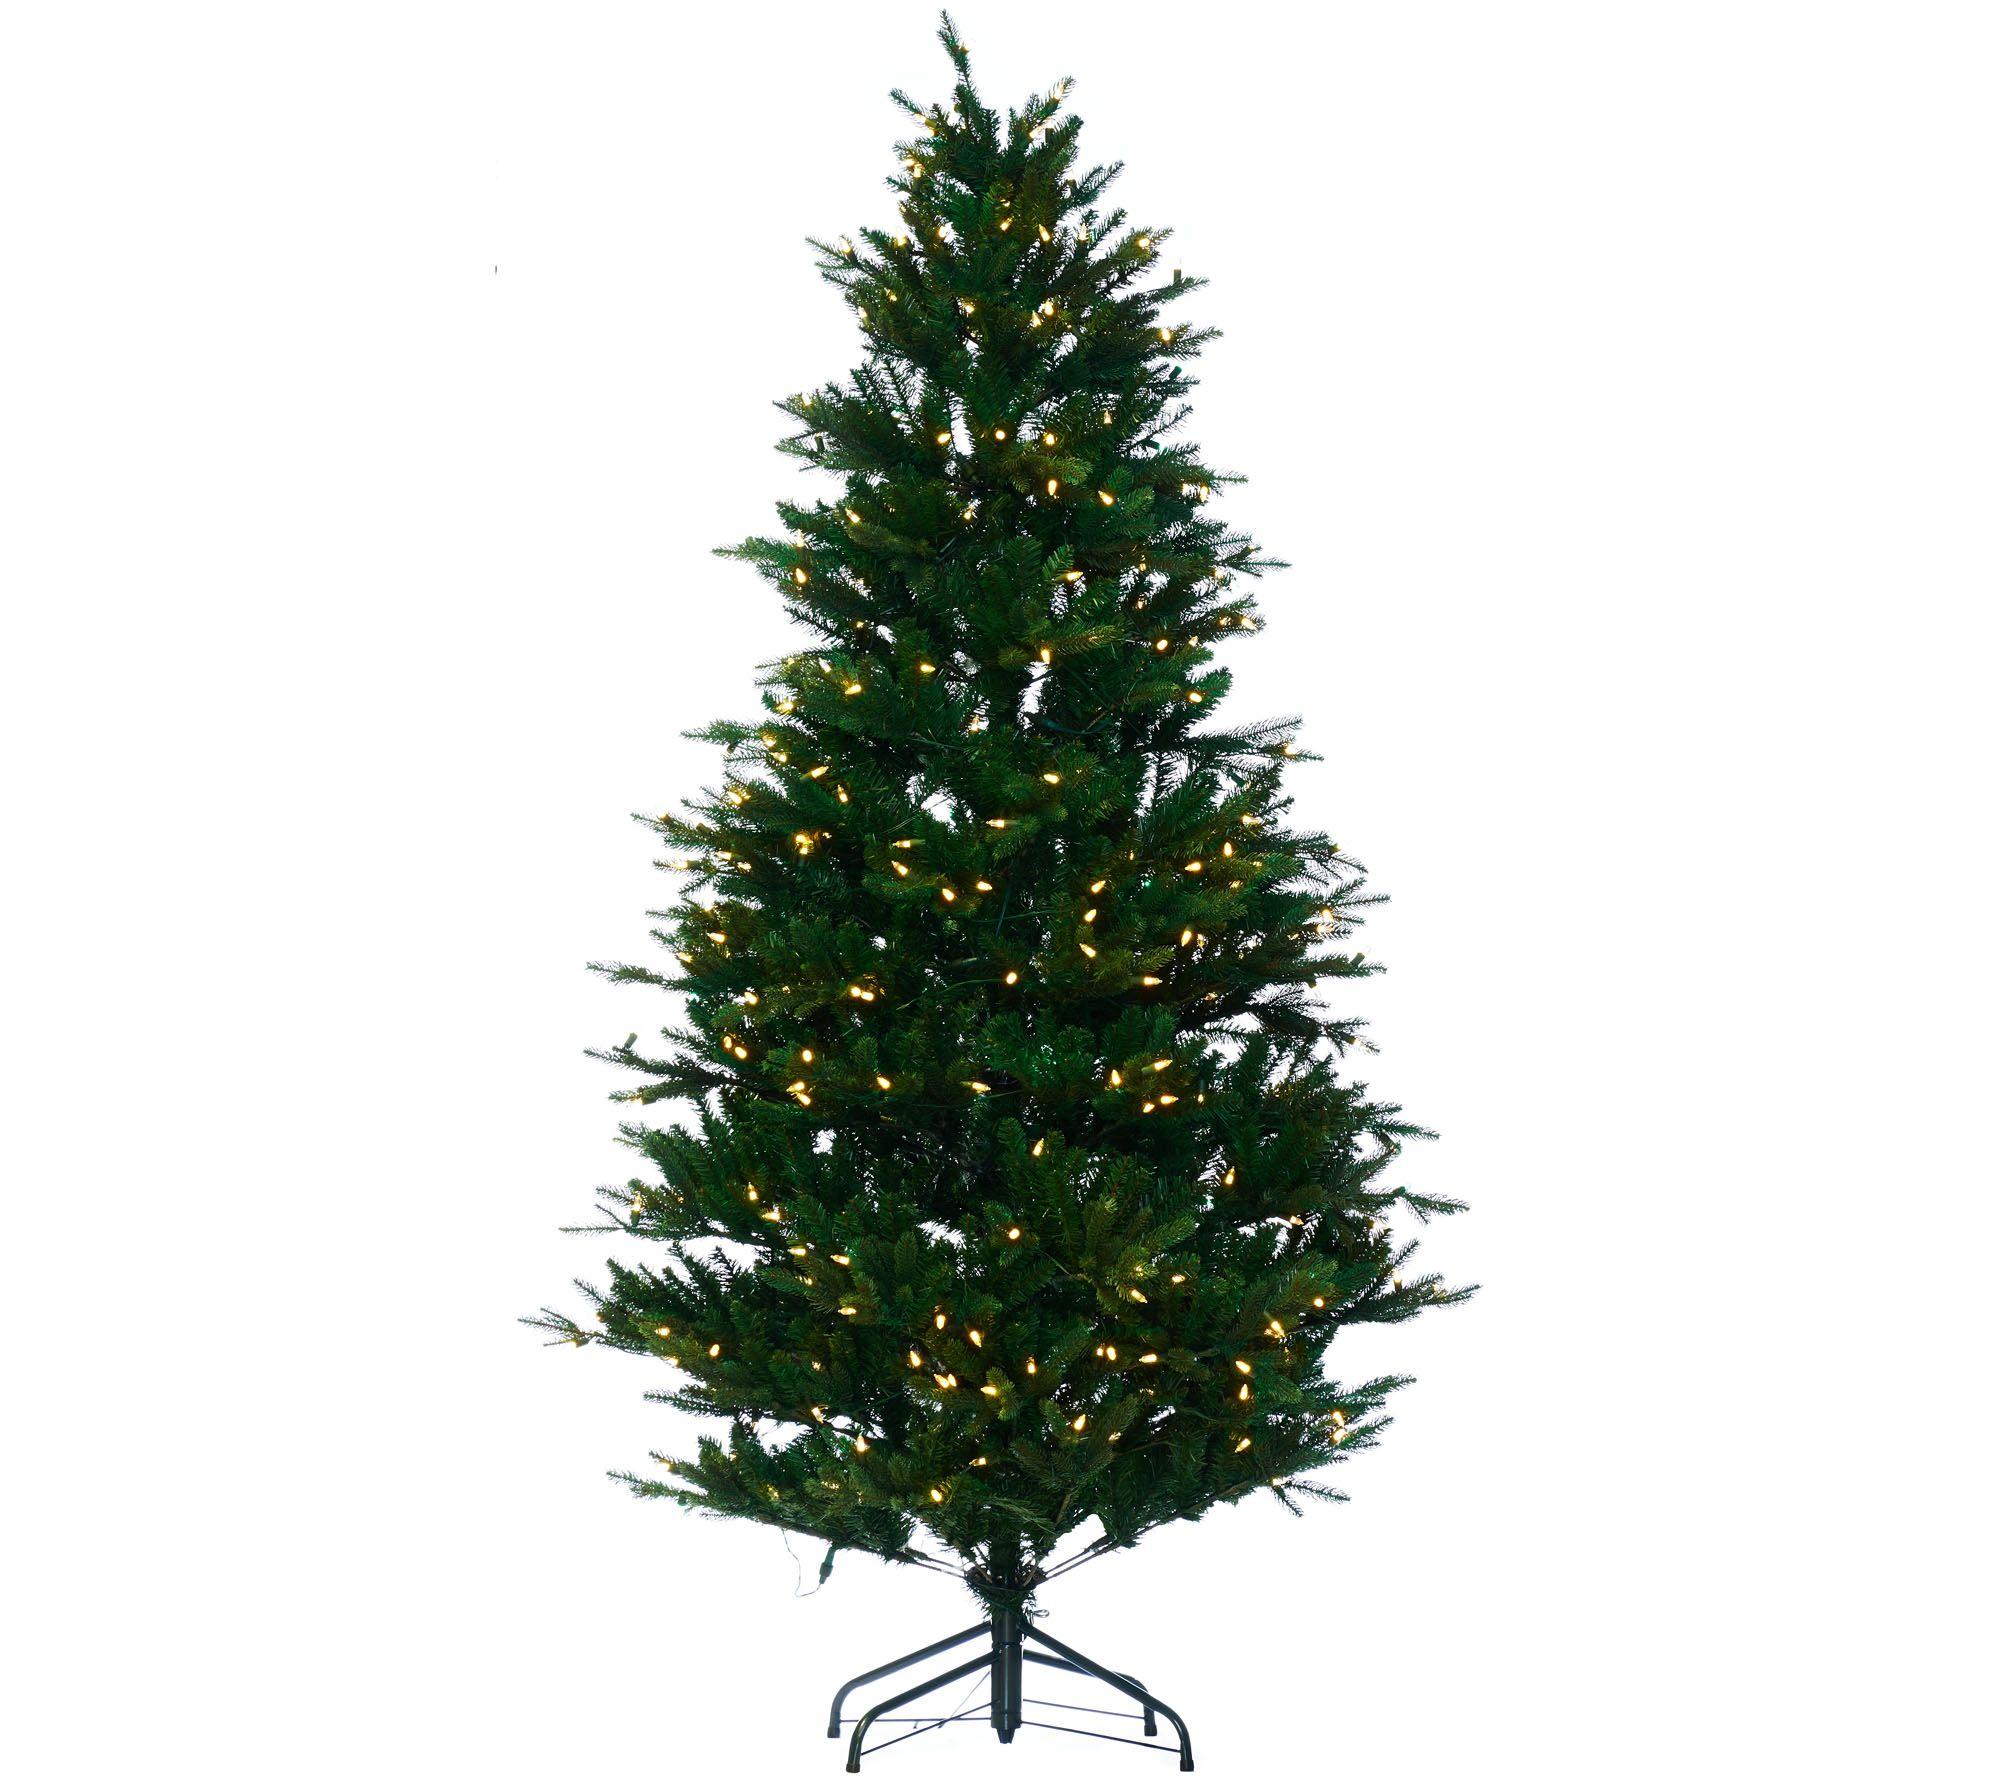 Christmas Tree Collection Trowbridge : Santa s best rgb green balsam fir christmas tree